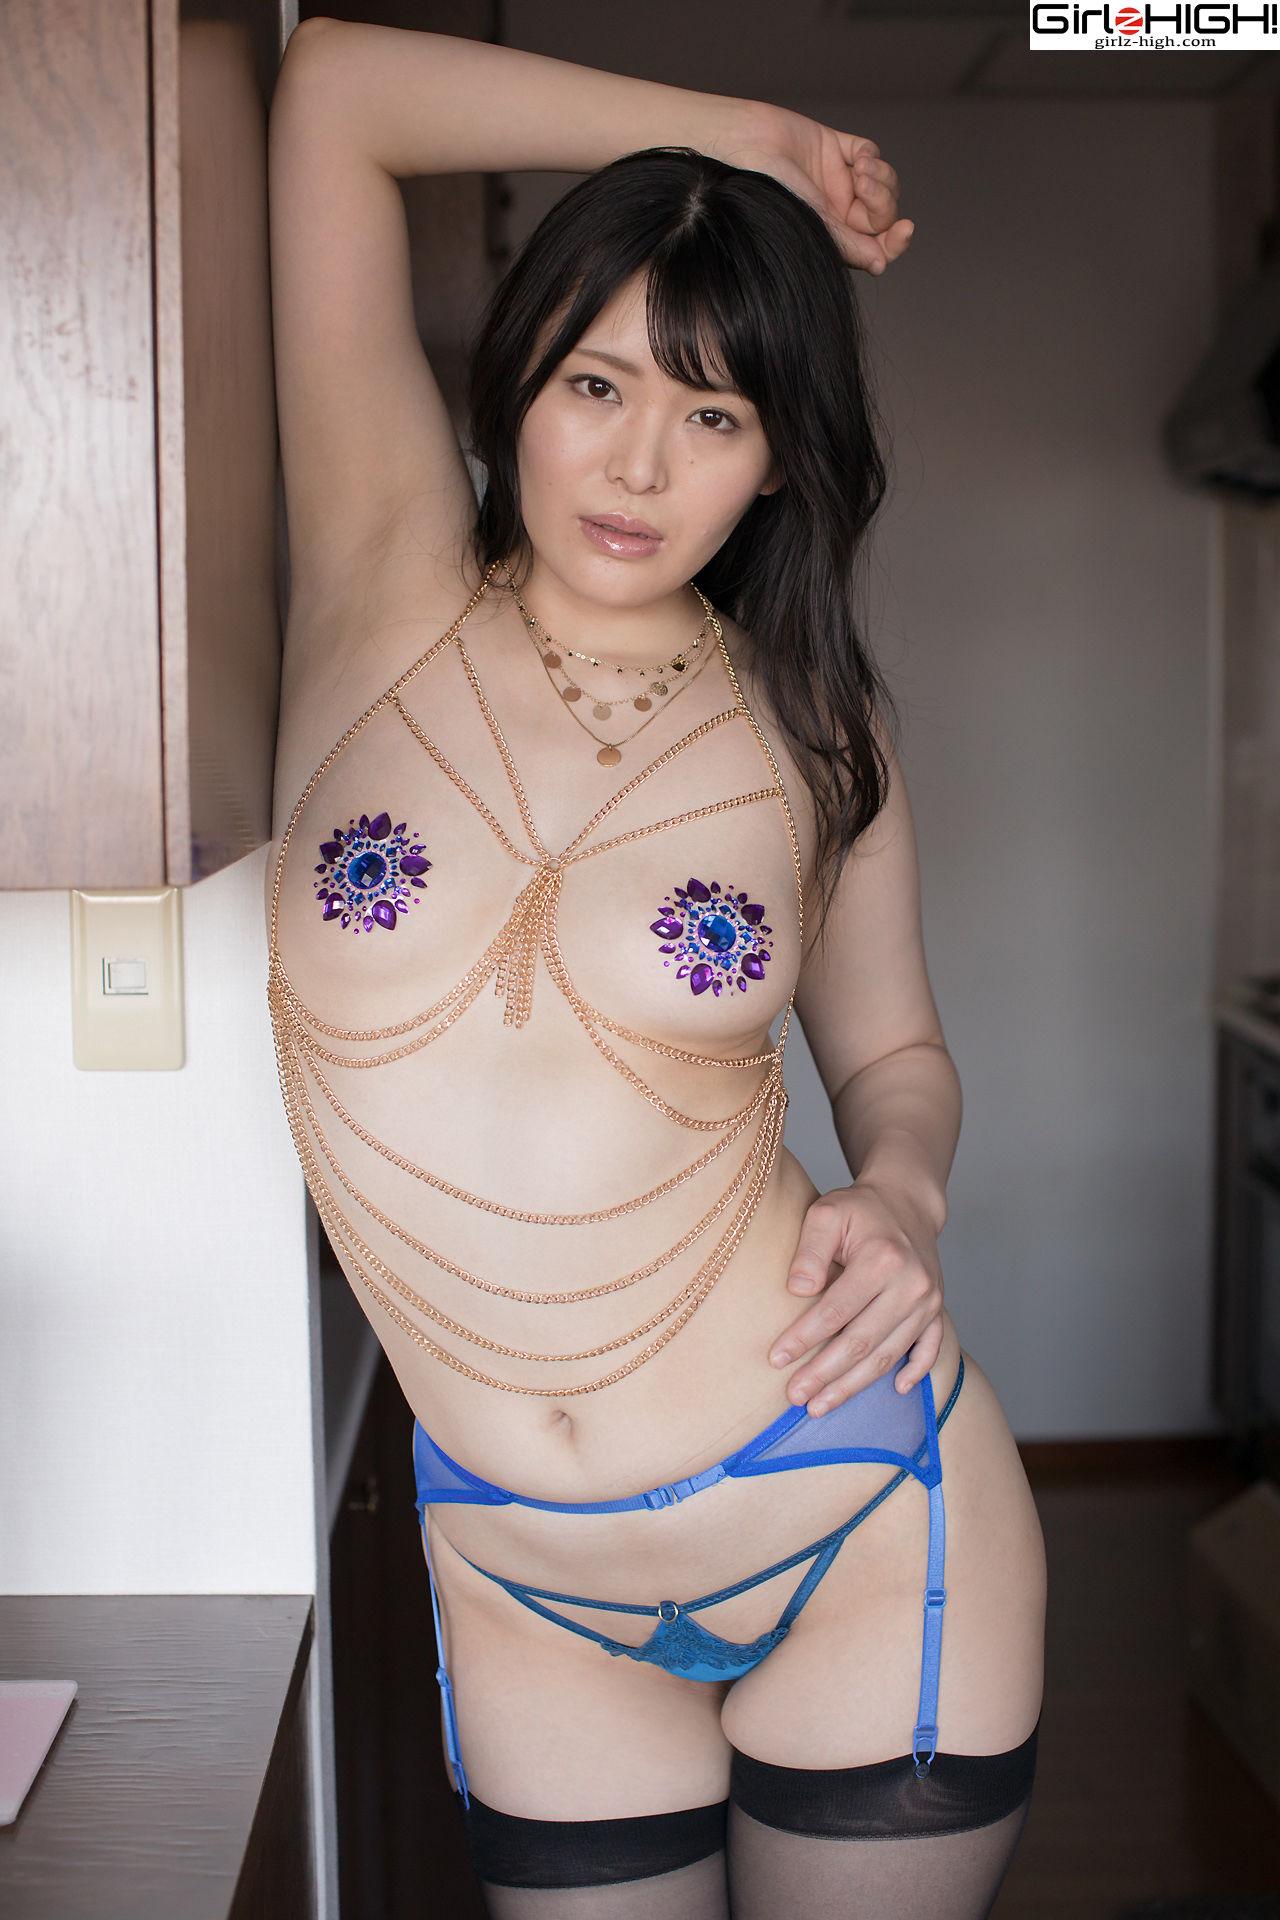 VOL.781 [Girlz-High]女艺人丝袜熟女:鹤祀真步(鶴祀眞歩)超高清写真套图(38P)